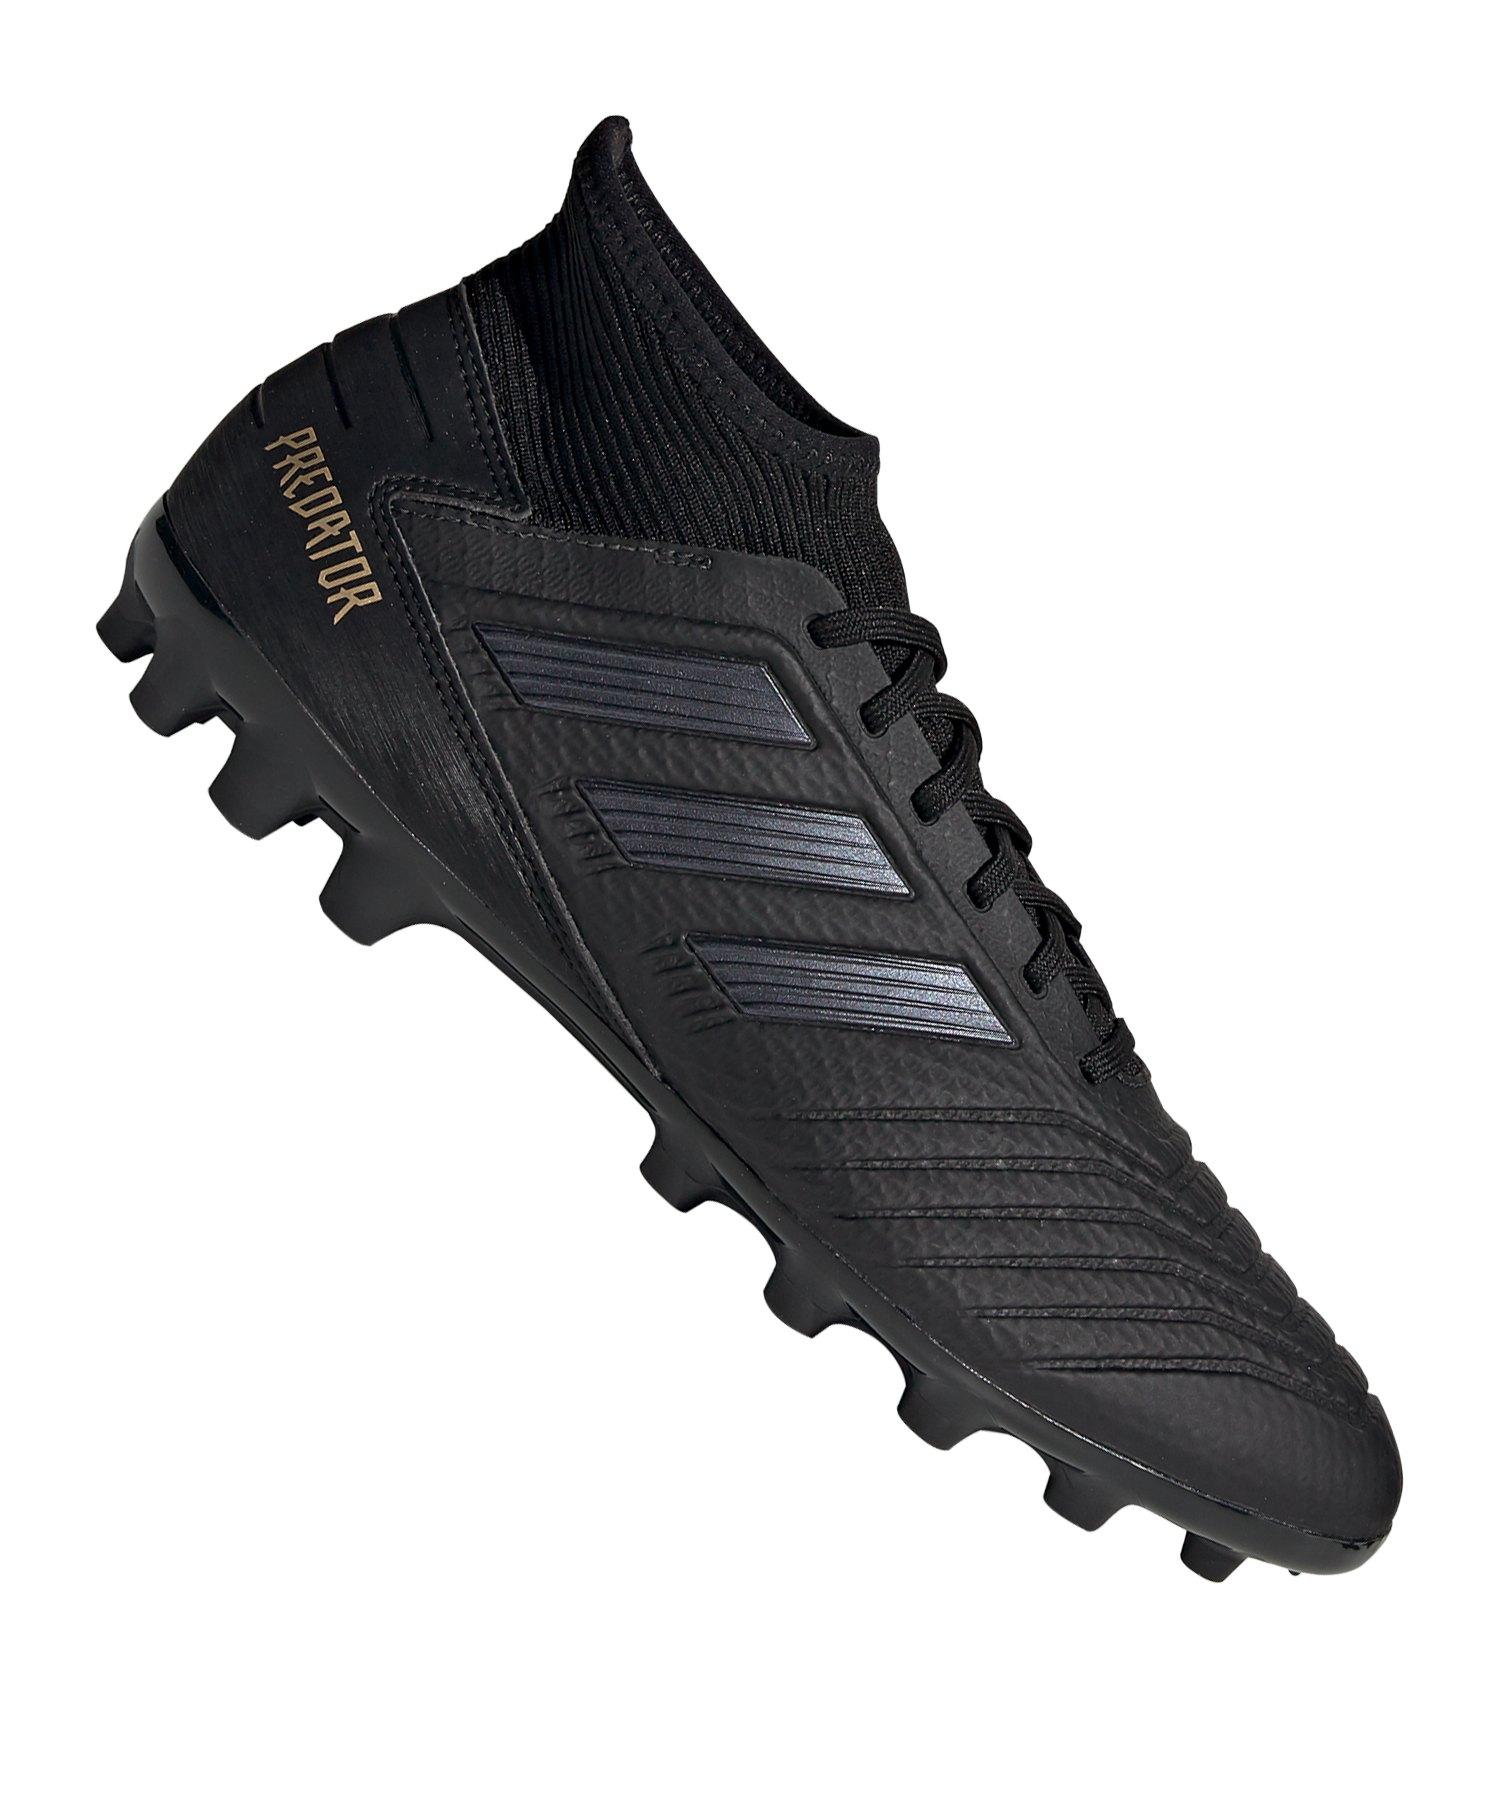 adidas Predator 19.3 AG Schwarz - schwarz